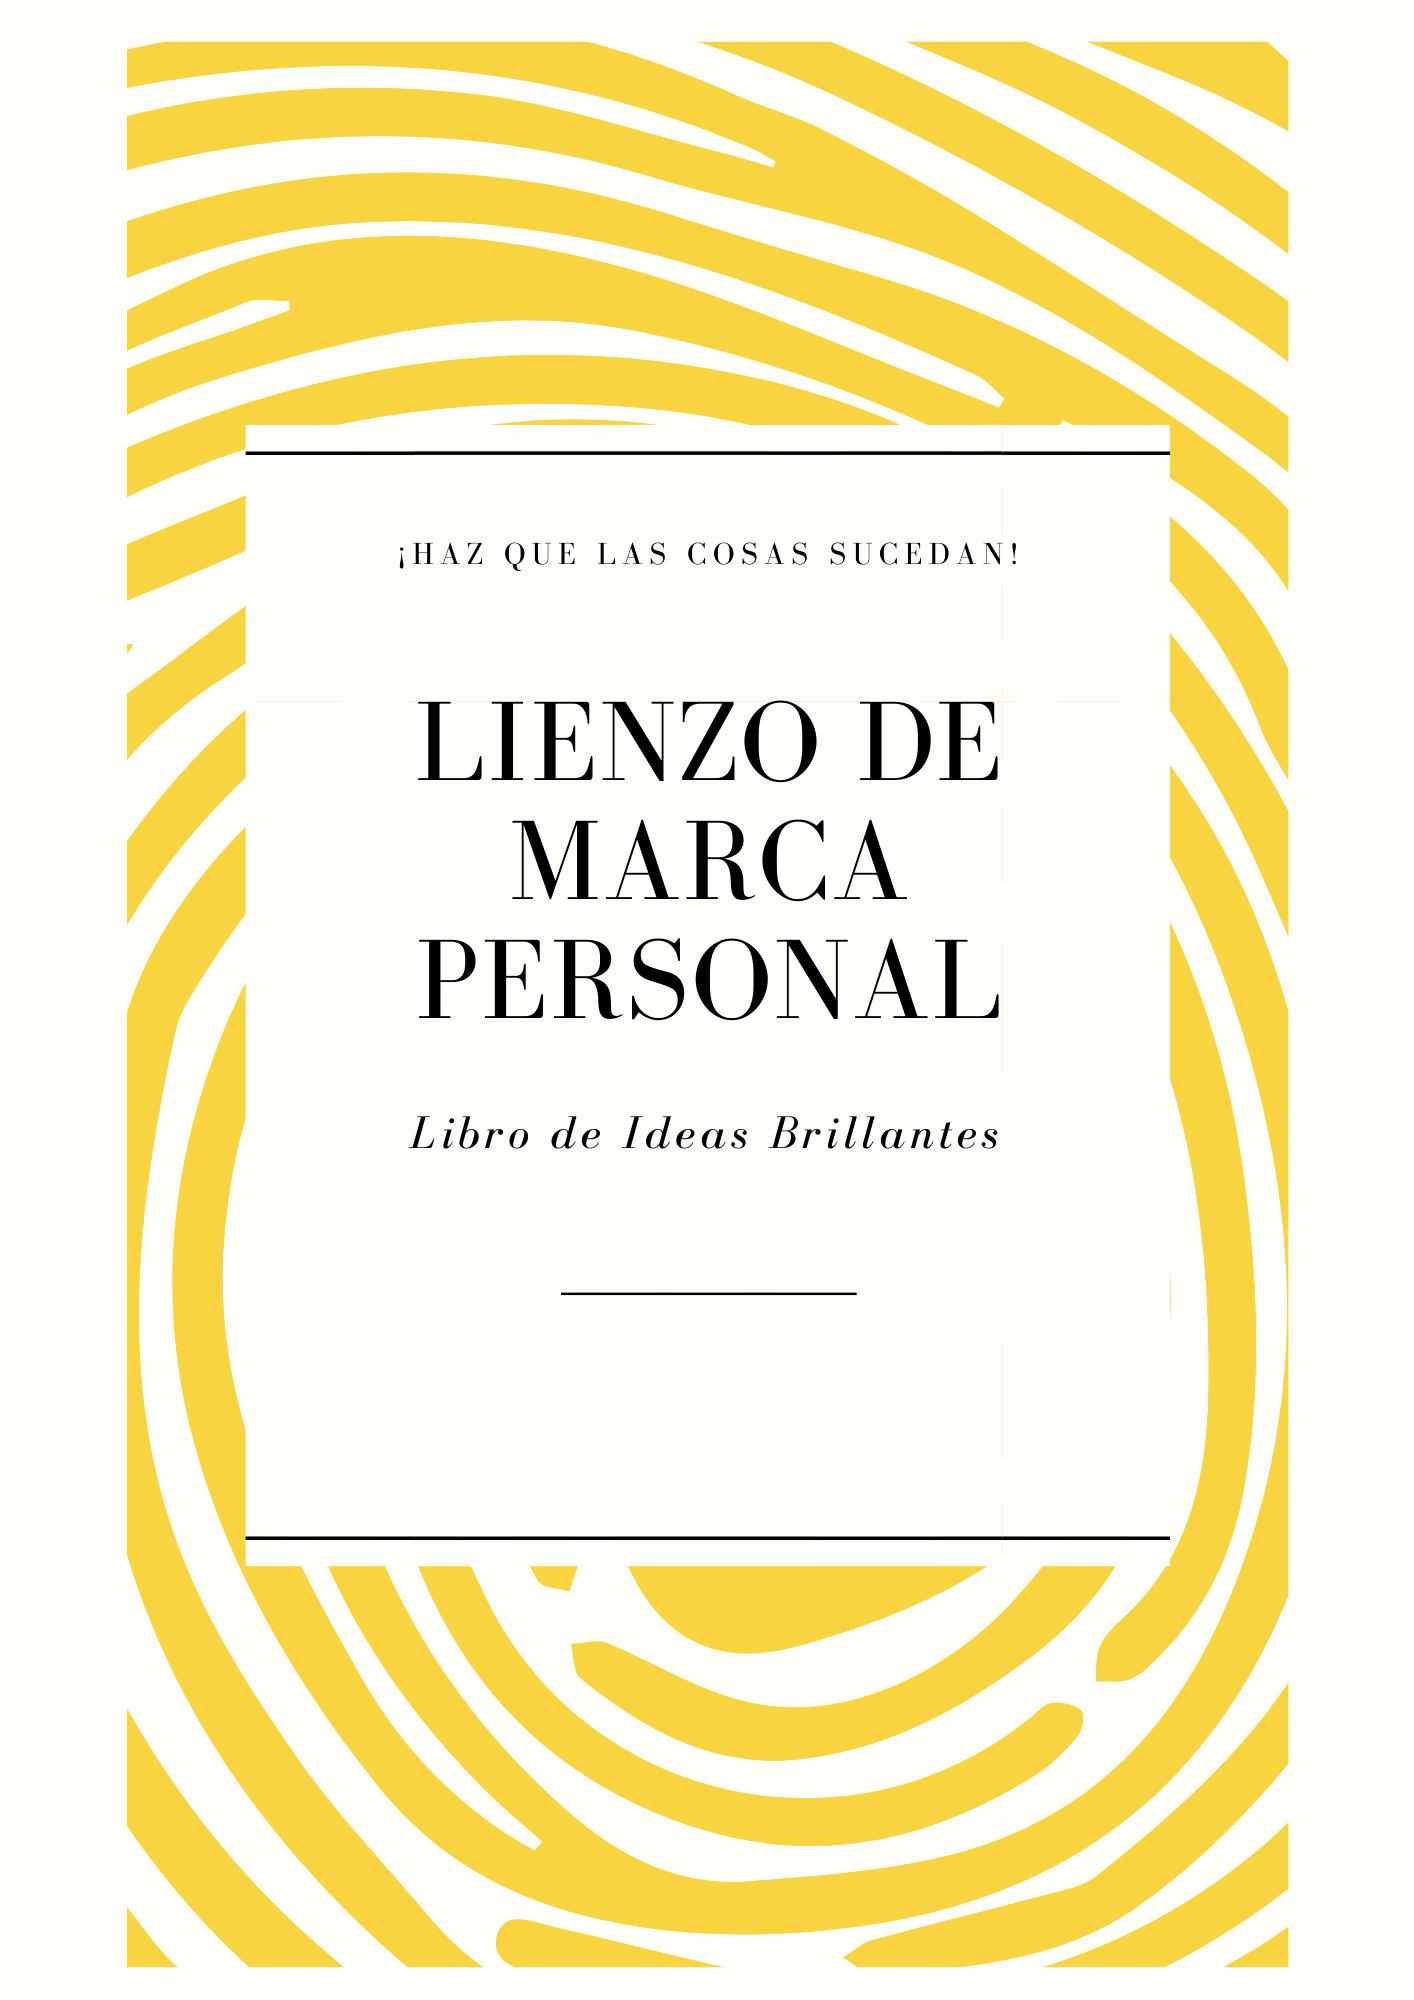 Lienzo de Marca Personal